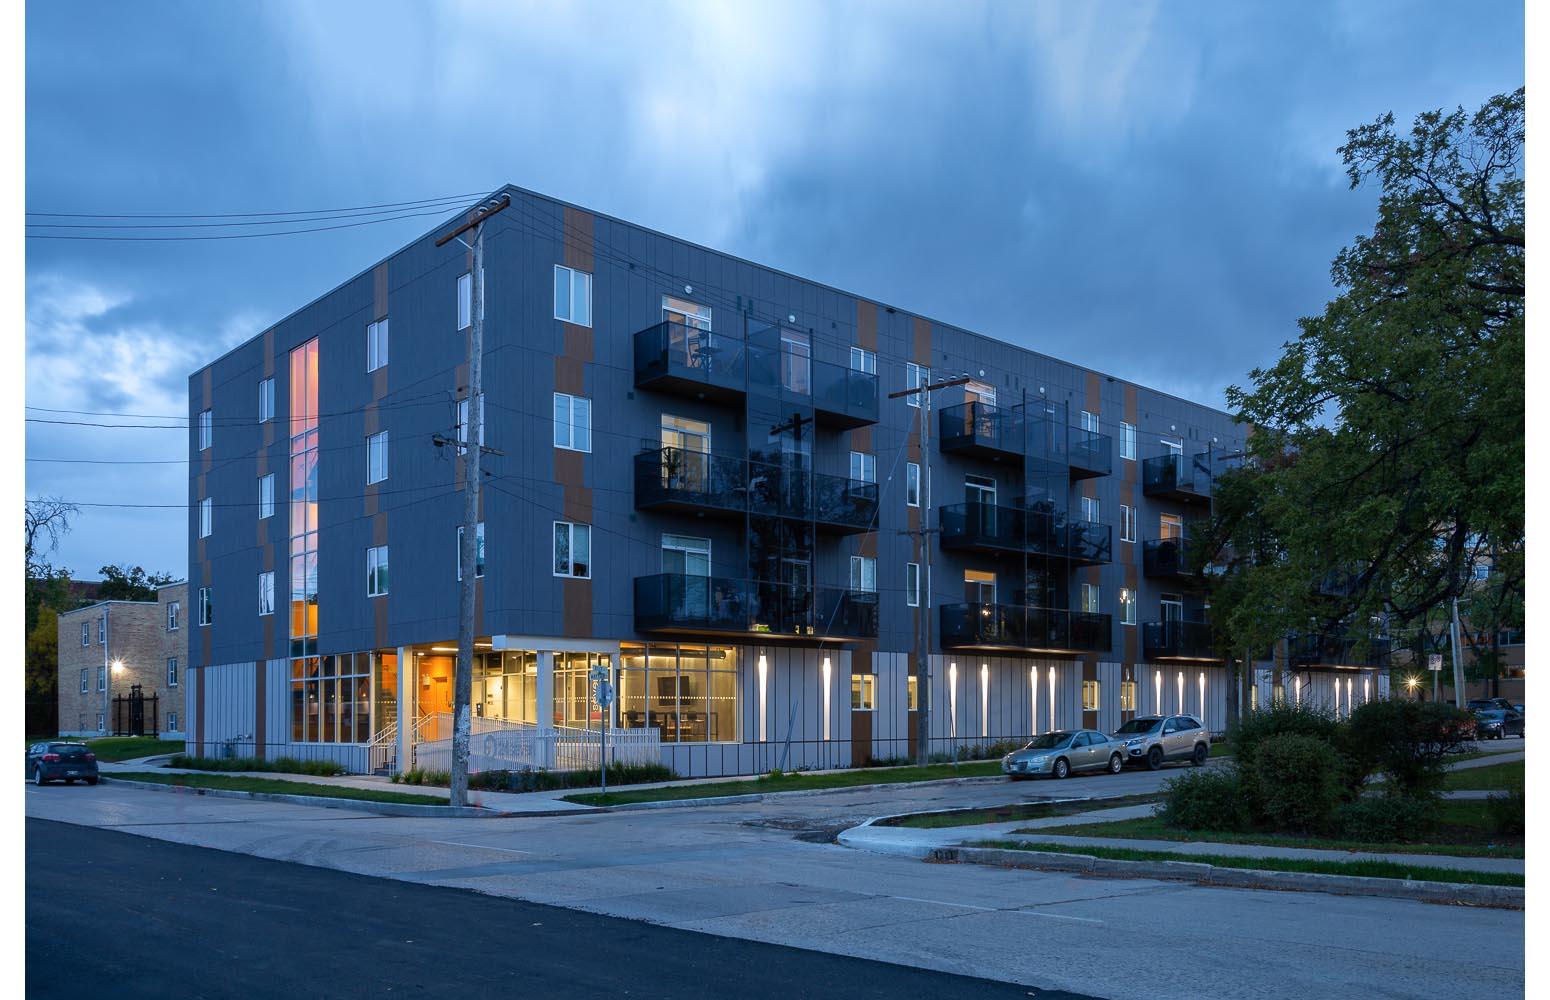 24Seven Condominium, photo of exterior at dusk / Photo:  Lindsay Reid